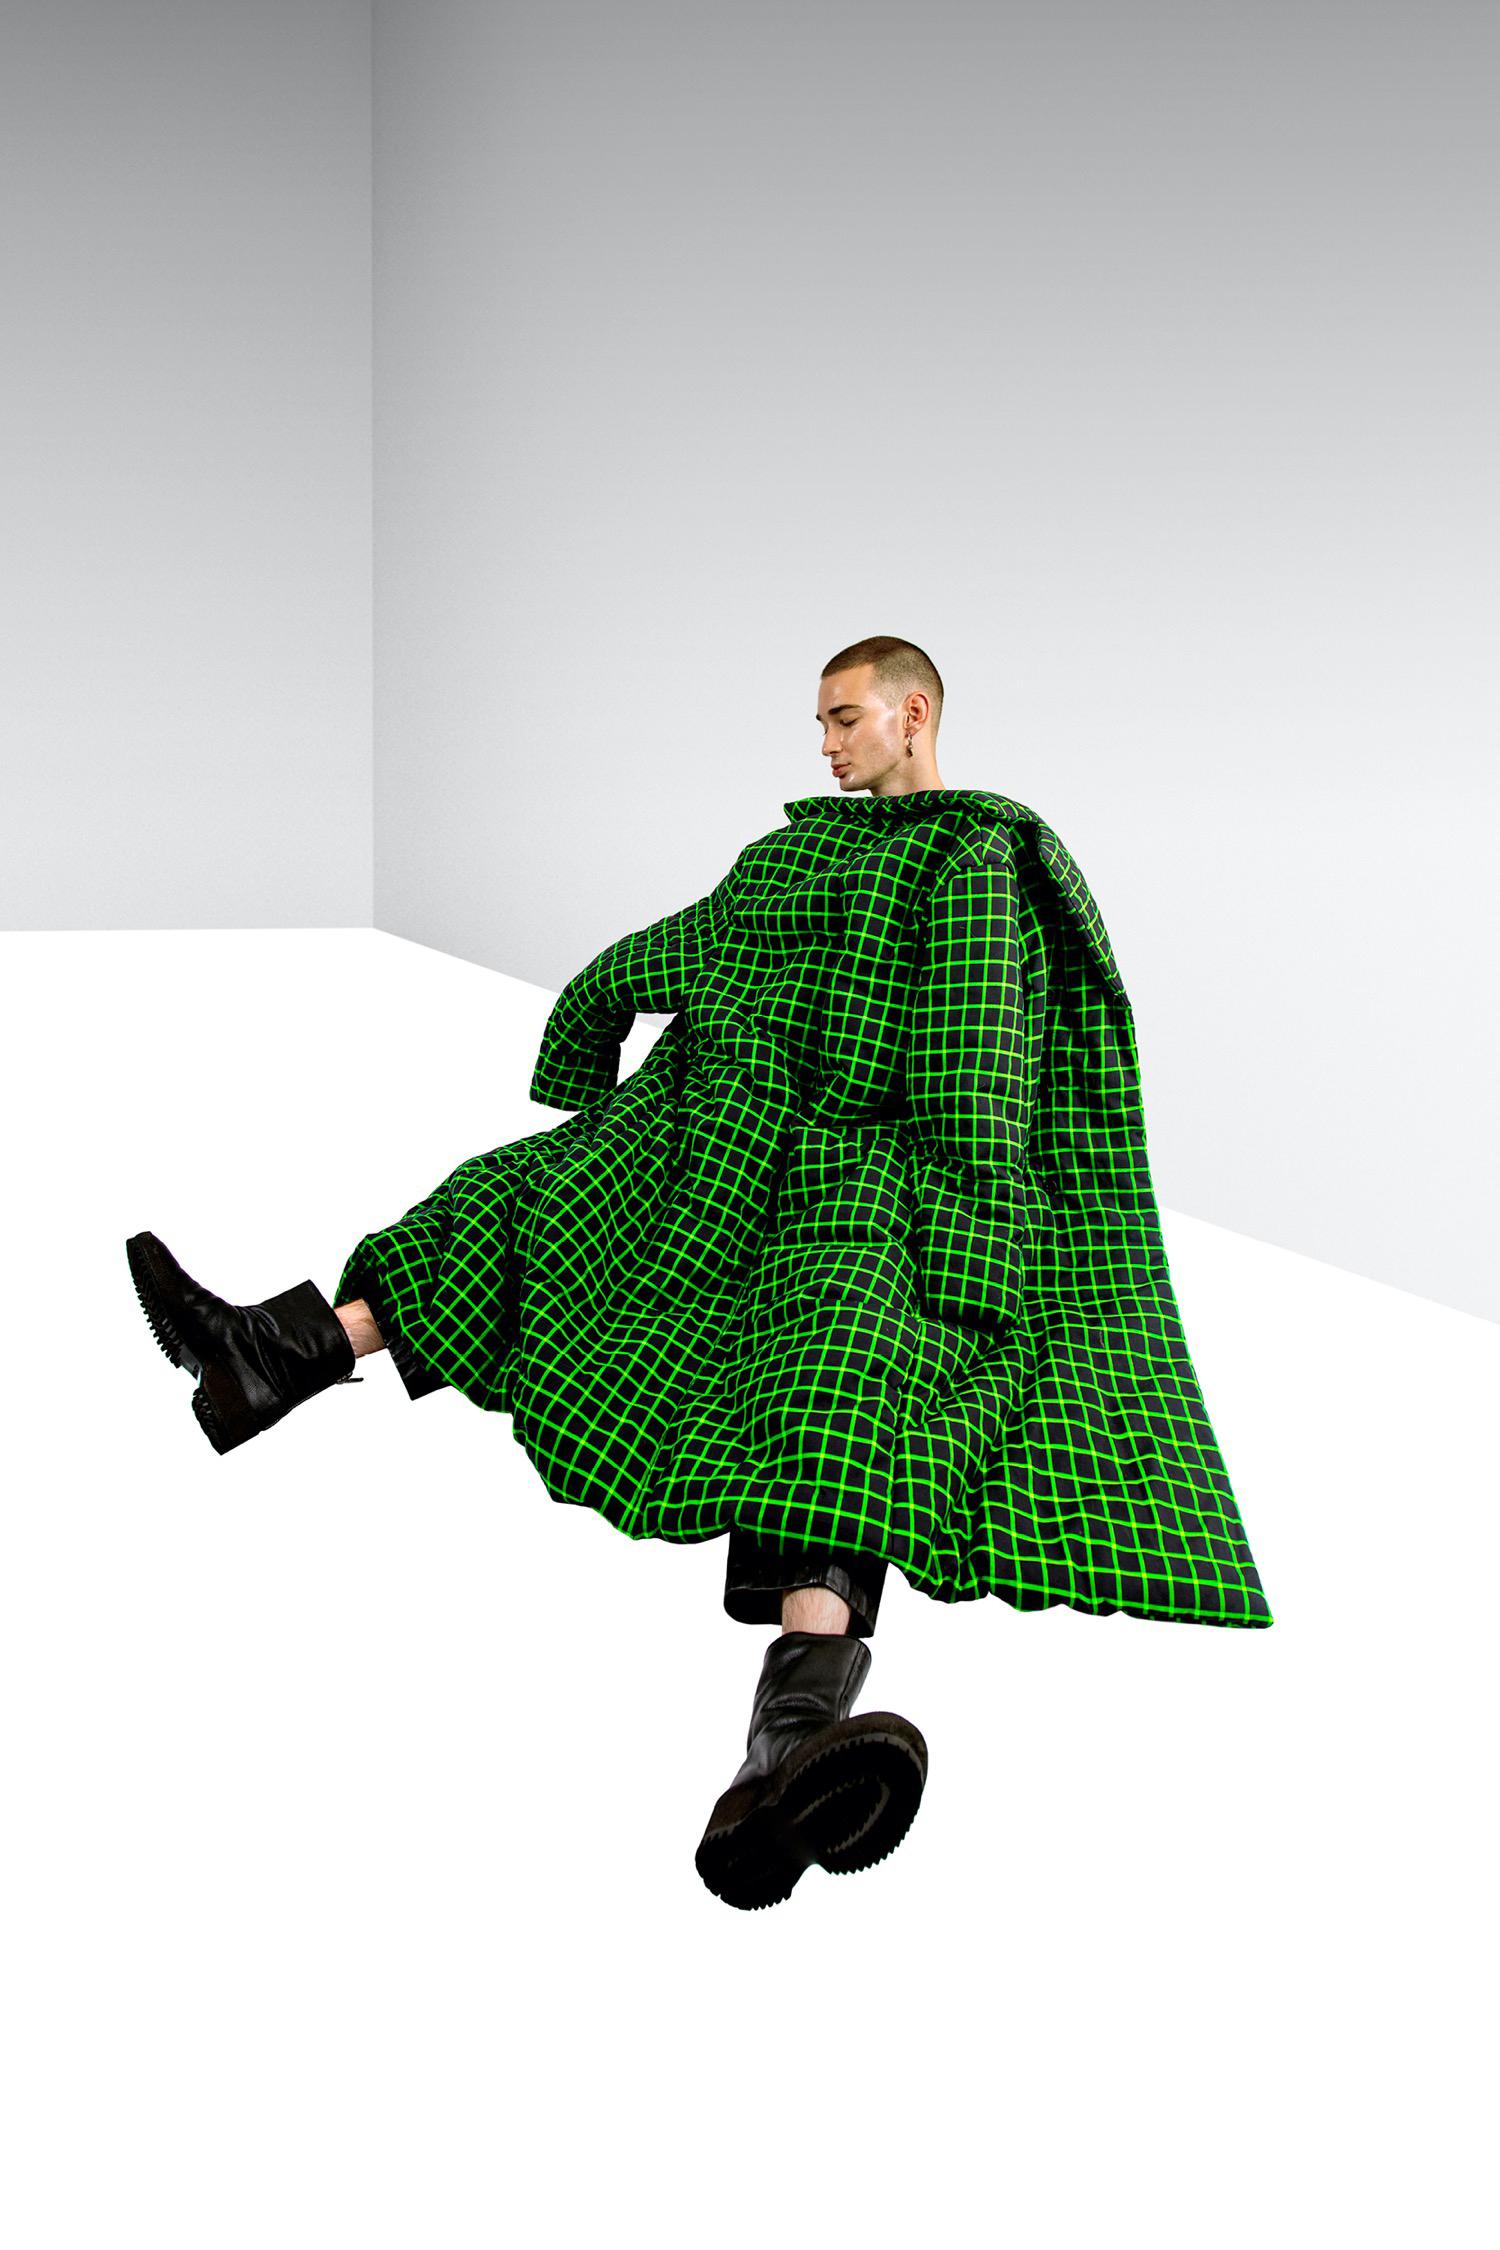 Sicky_kimdary_fashion_photographer-2b